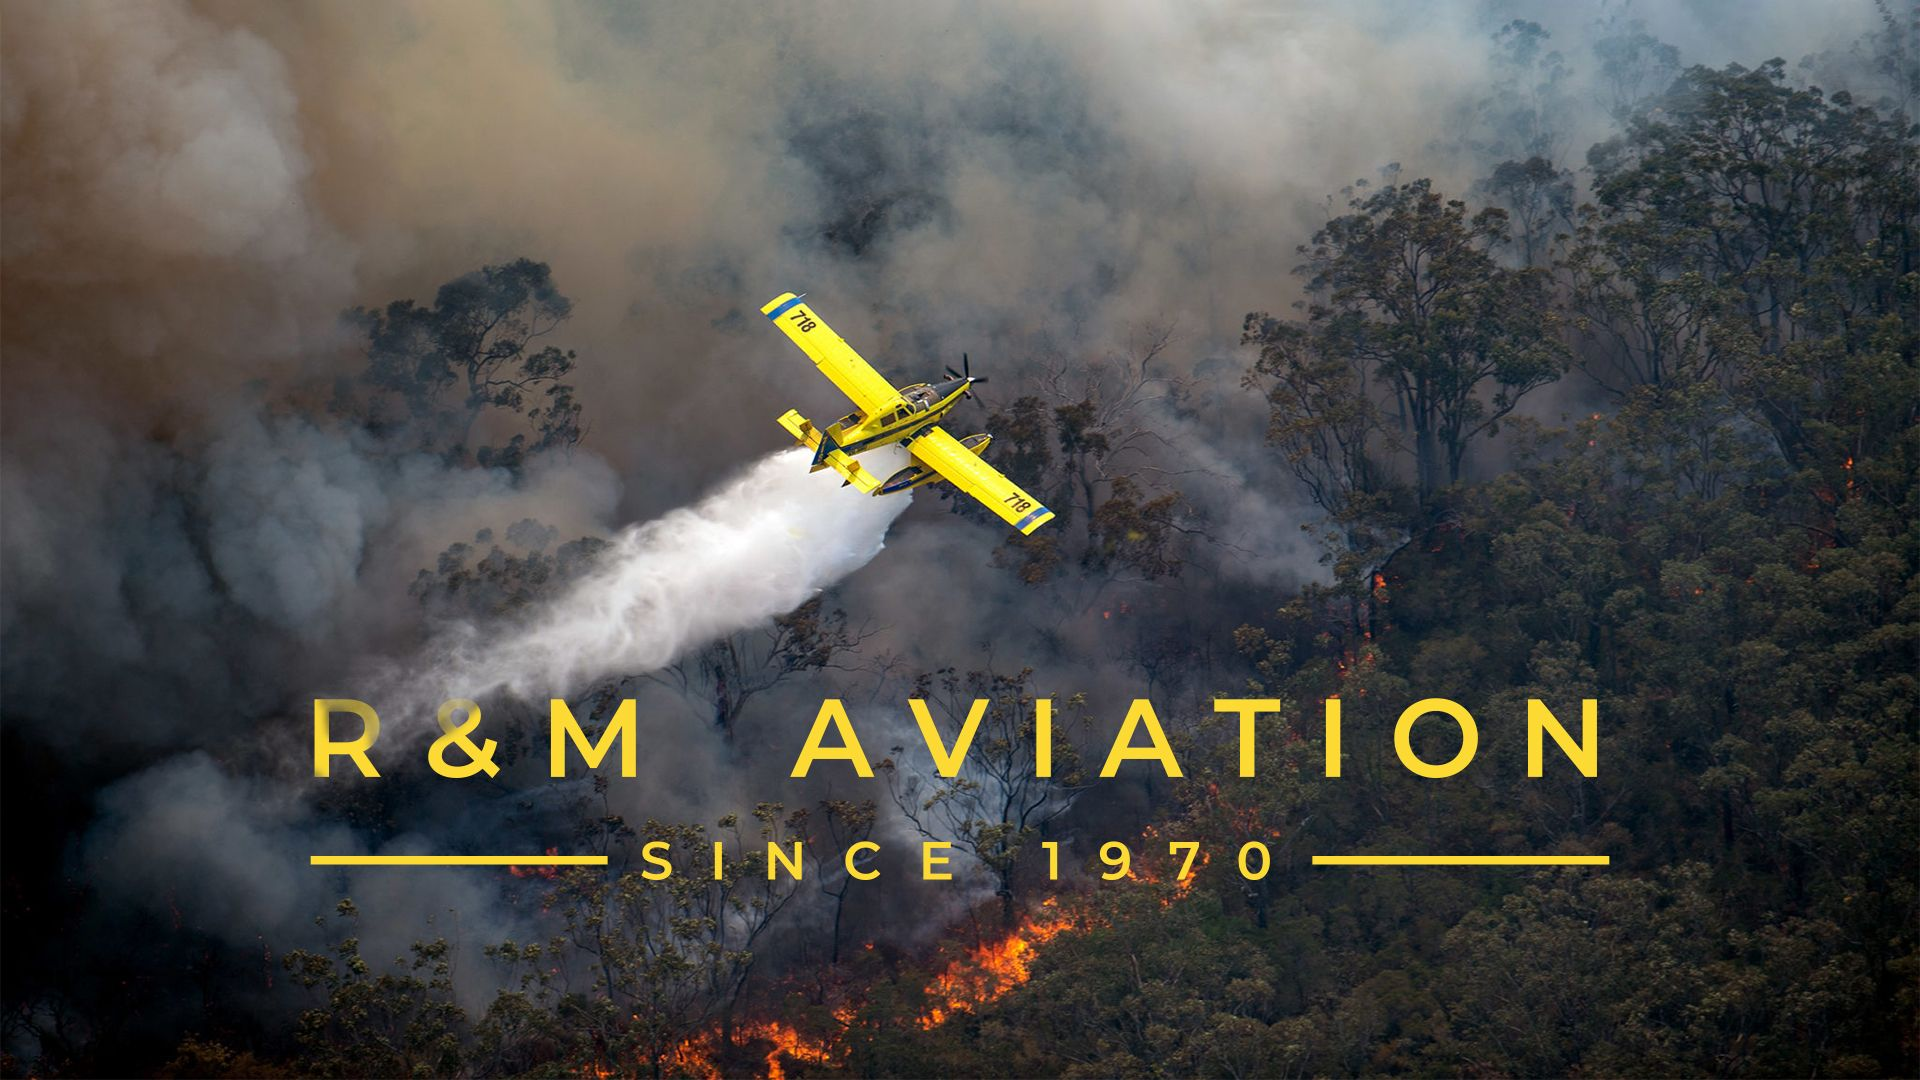 Website Development for R&M Aviation